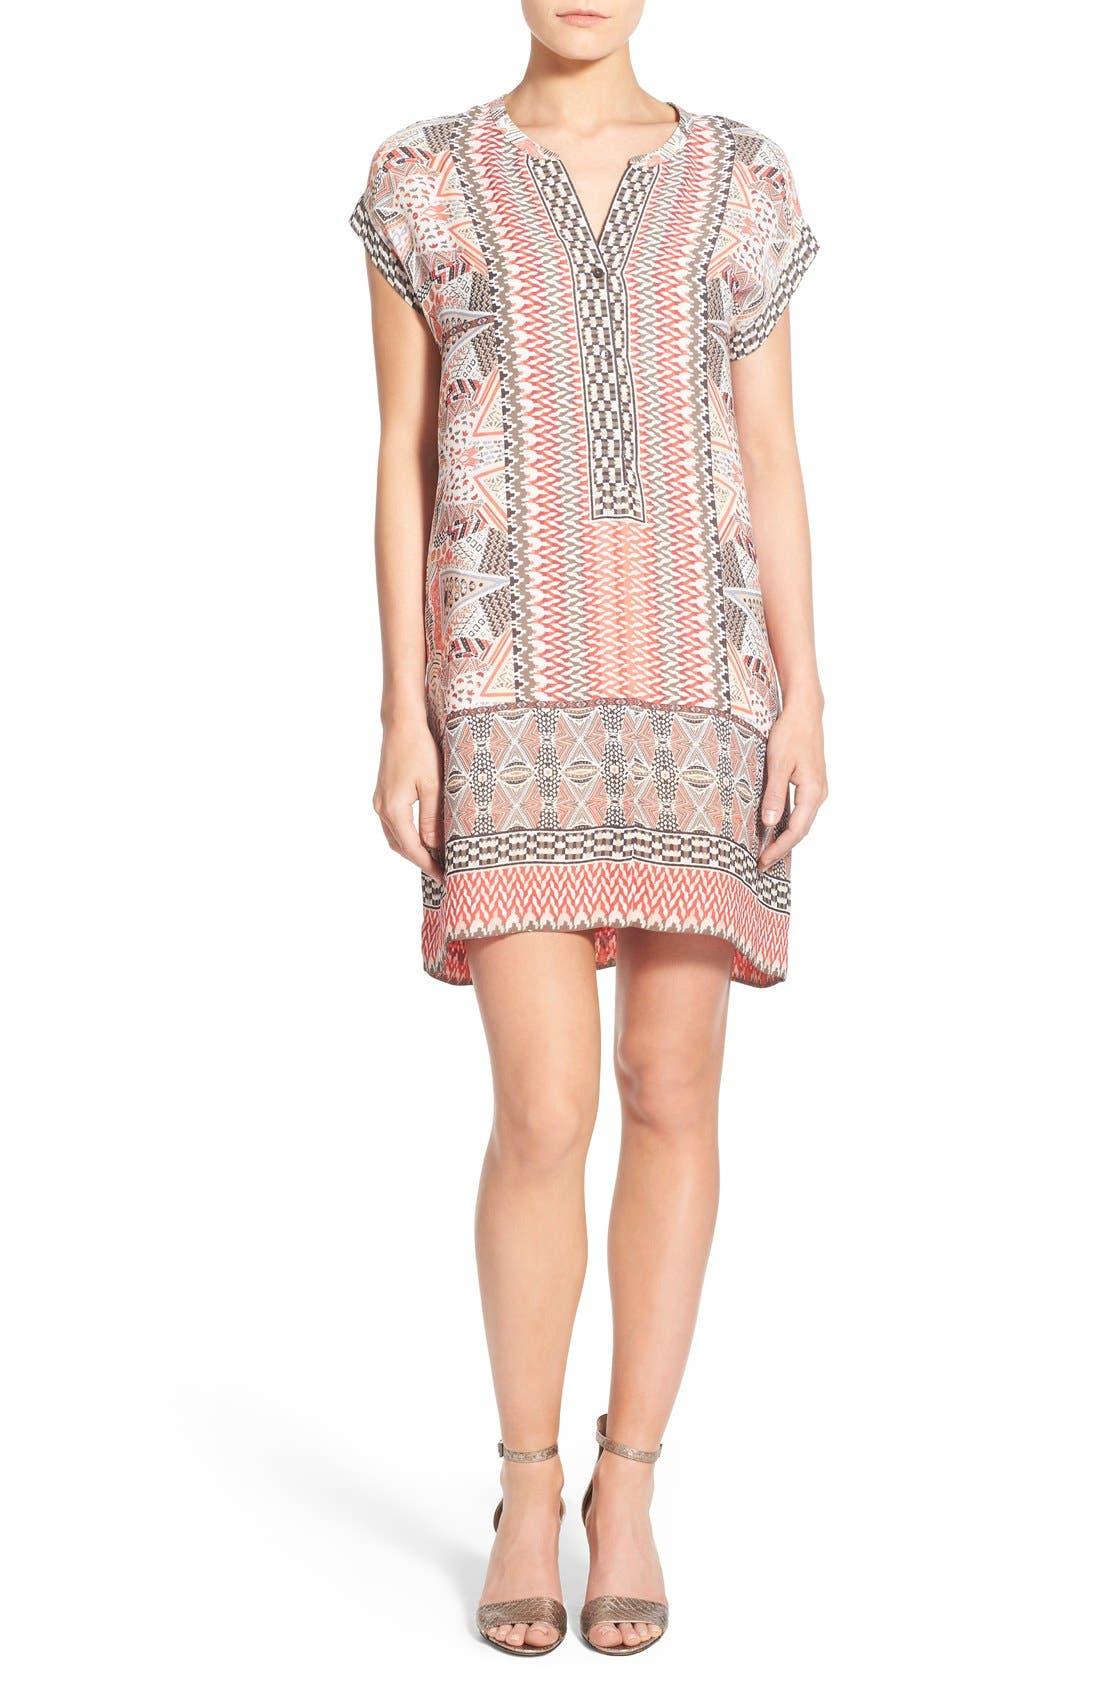 Main Image - NIC+ZOE 'Prismatic' Print Shift Dress